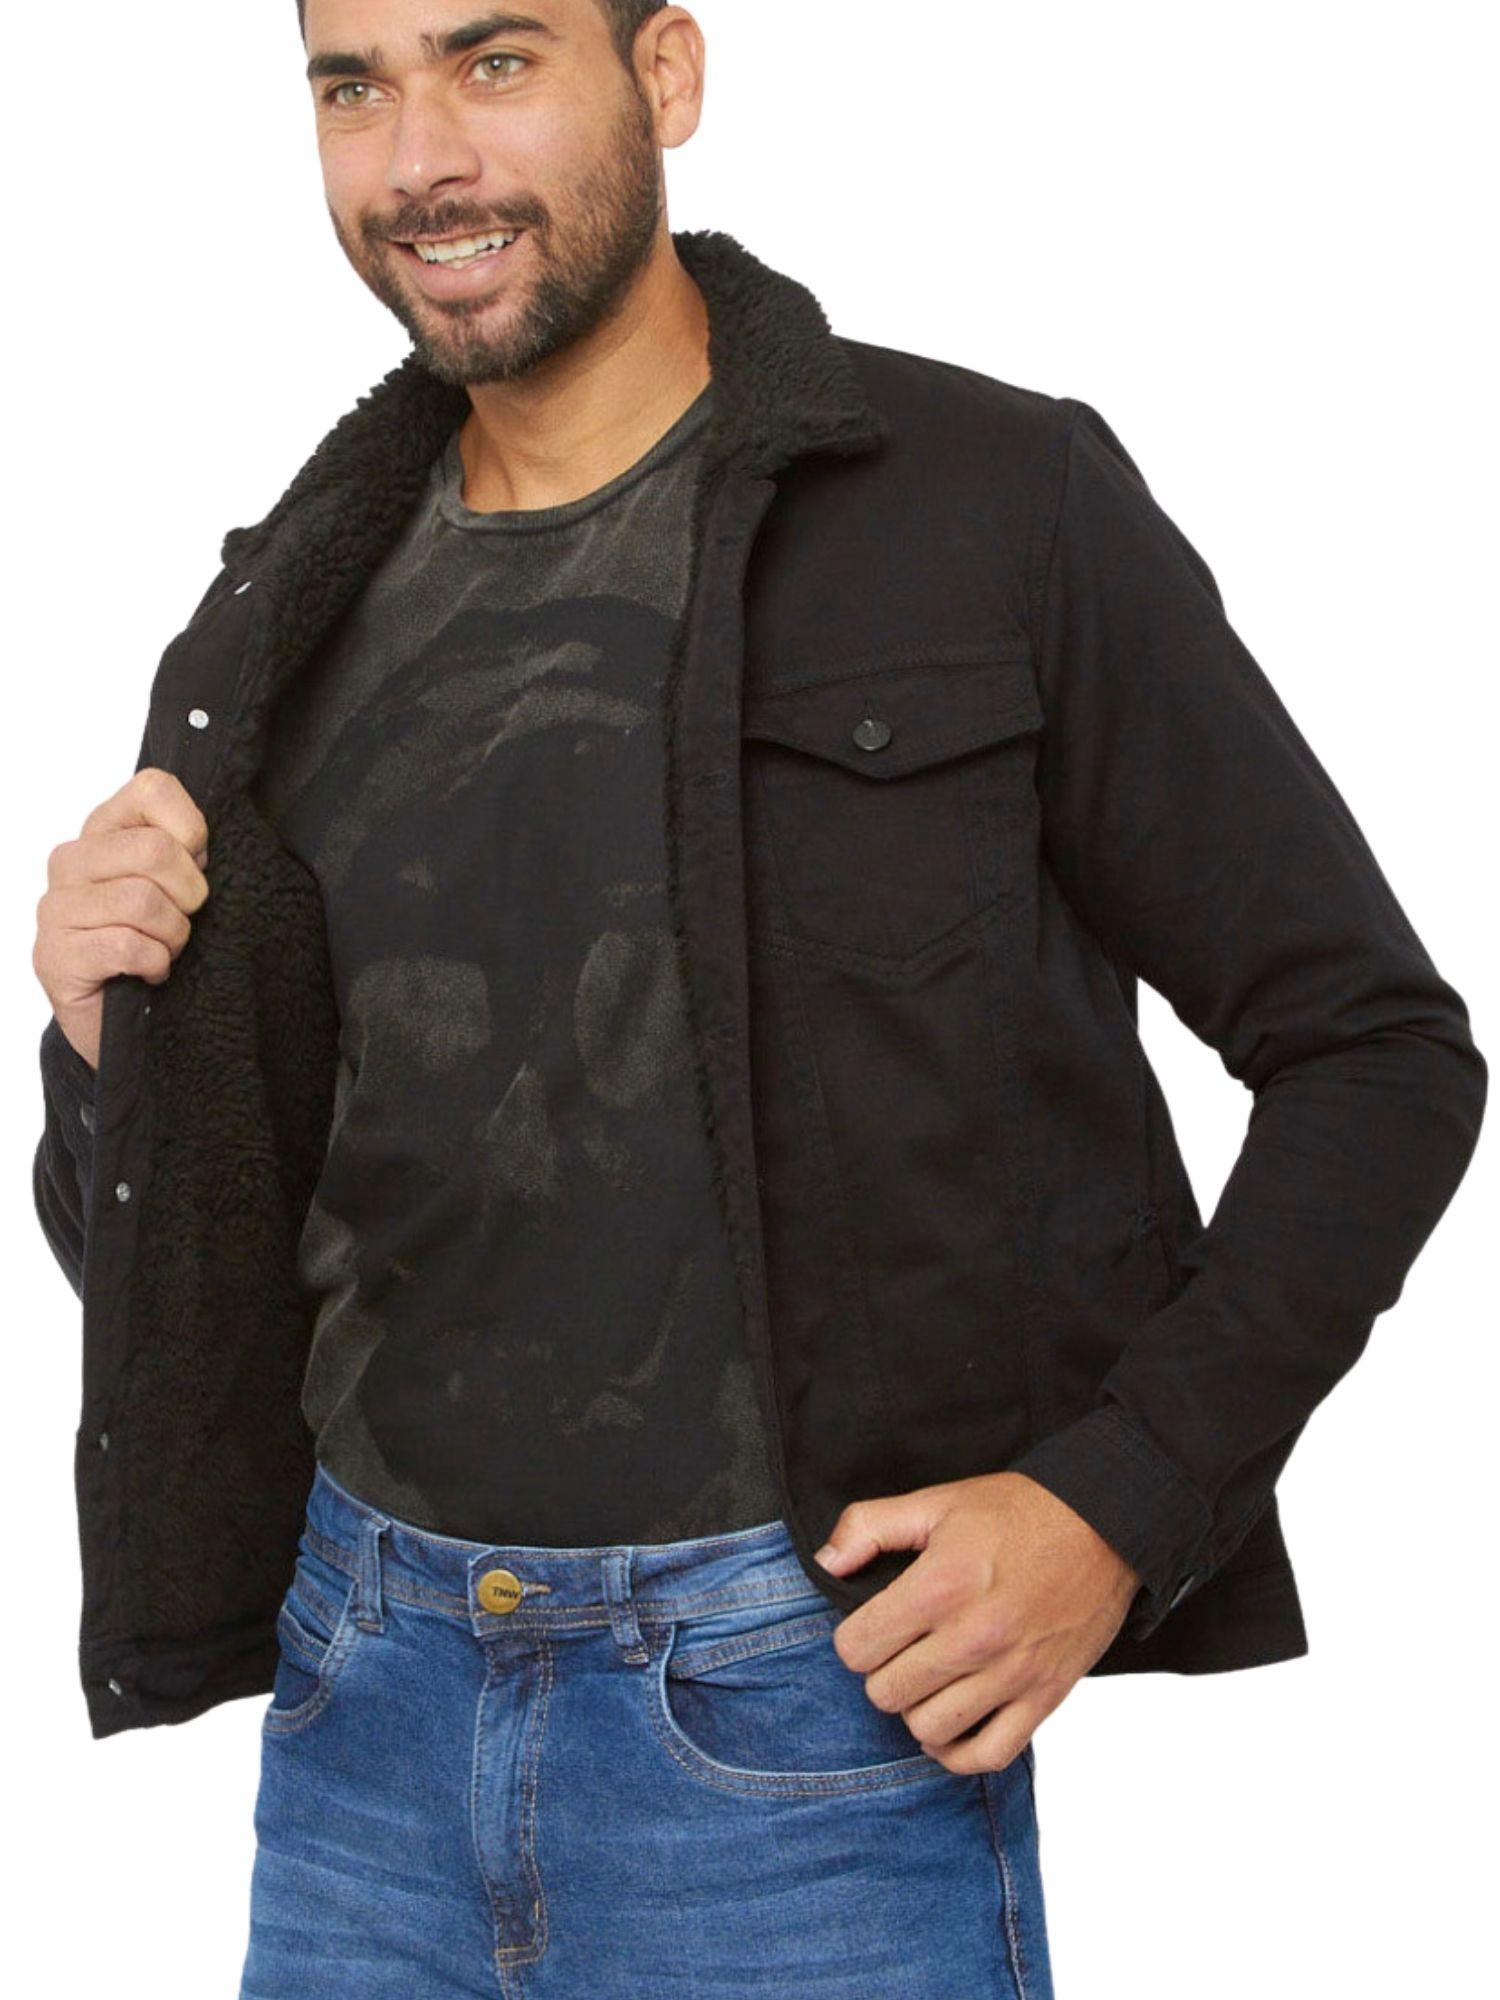 Jaqueta Masculina Jeans Forrada Tnw Jeans 51976